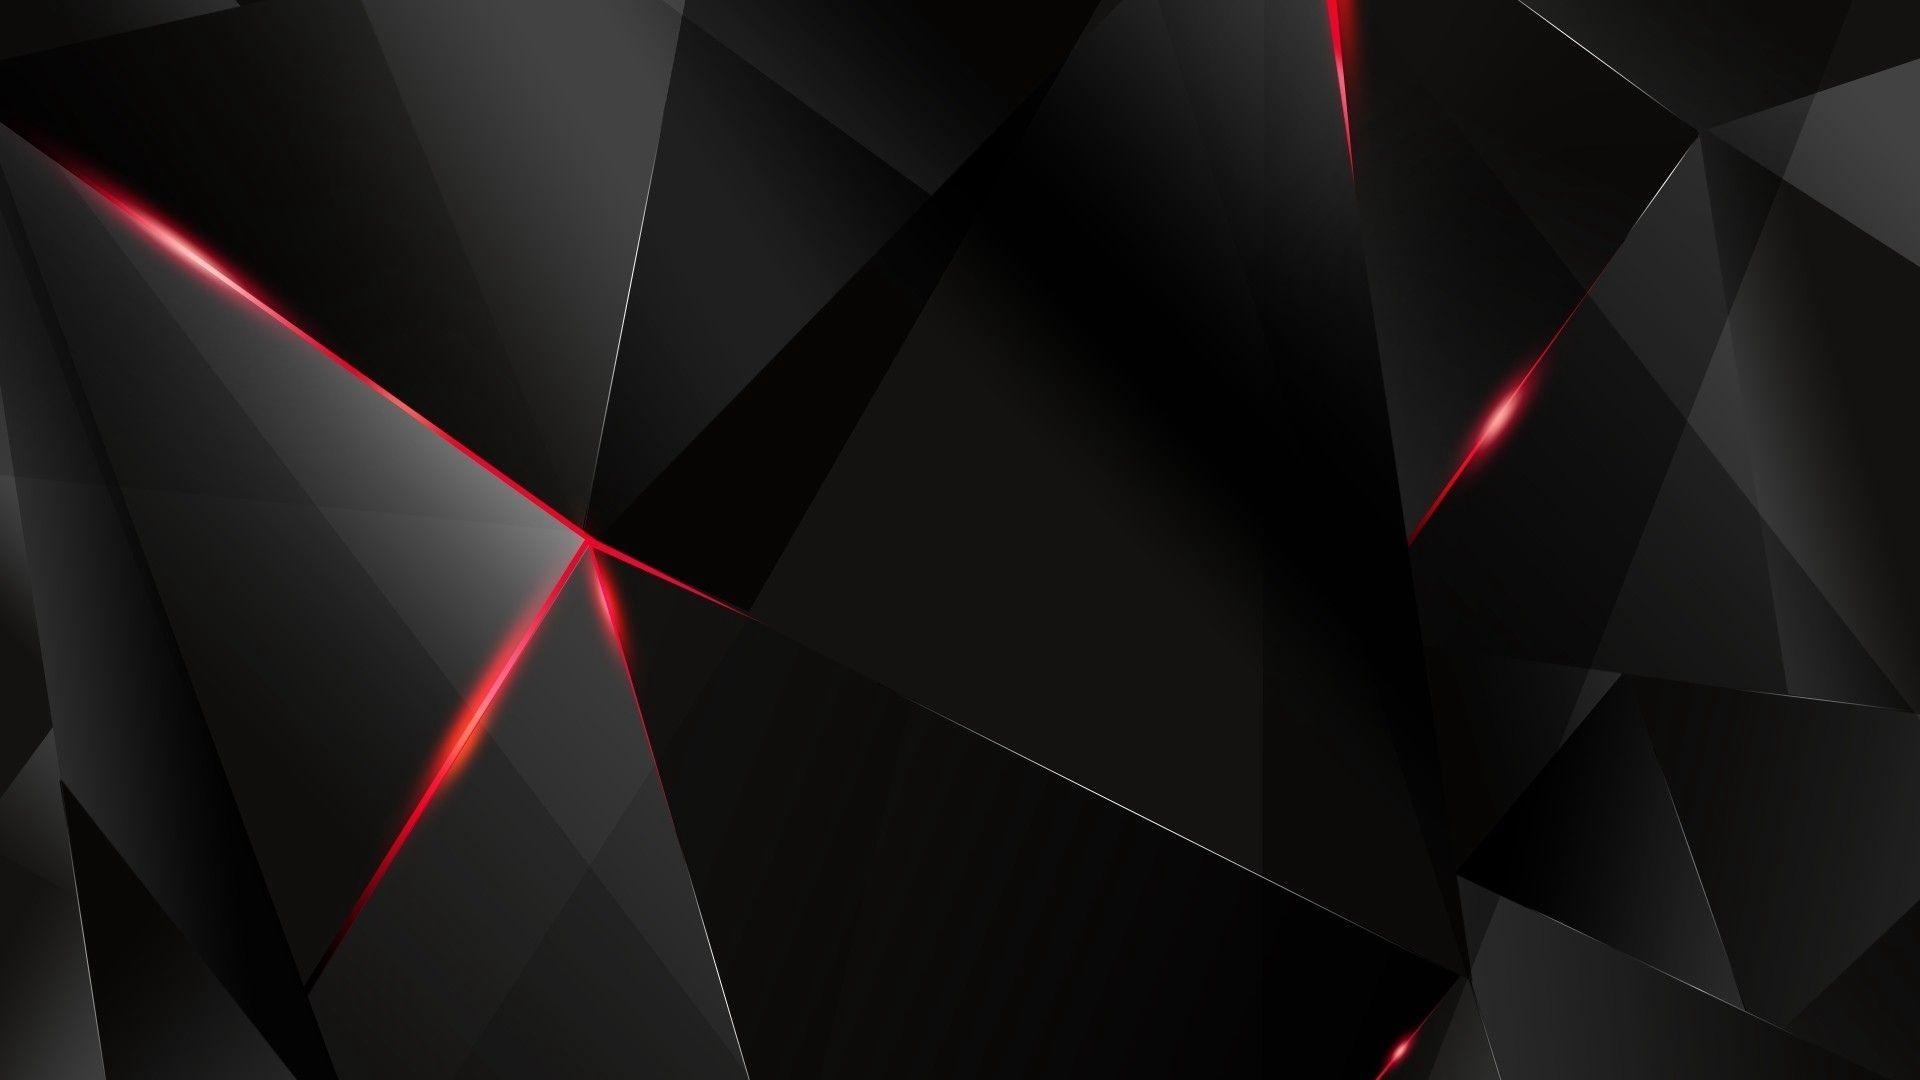 10 Most Popular Dark Hd Wallpaper 1920x1080 Full Hd 1920 1080 For Pc Desktop Night Forest Dark Forest Forest Sounds